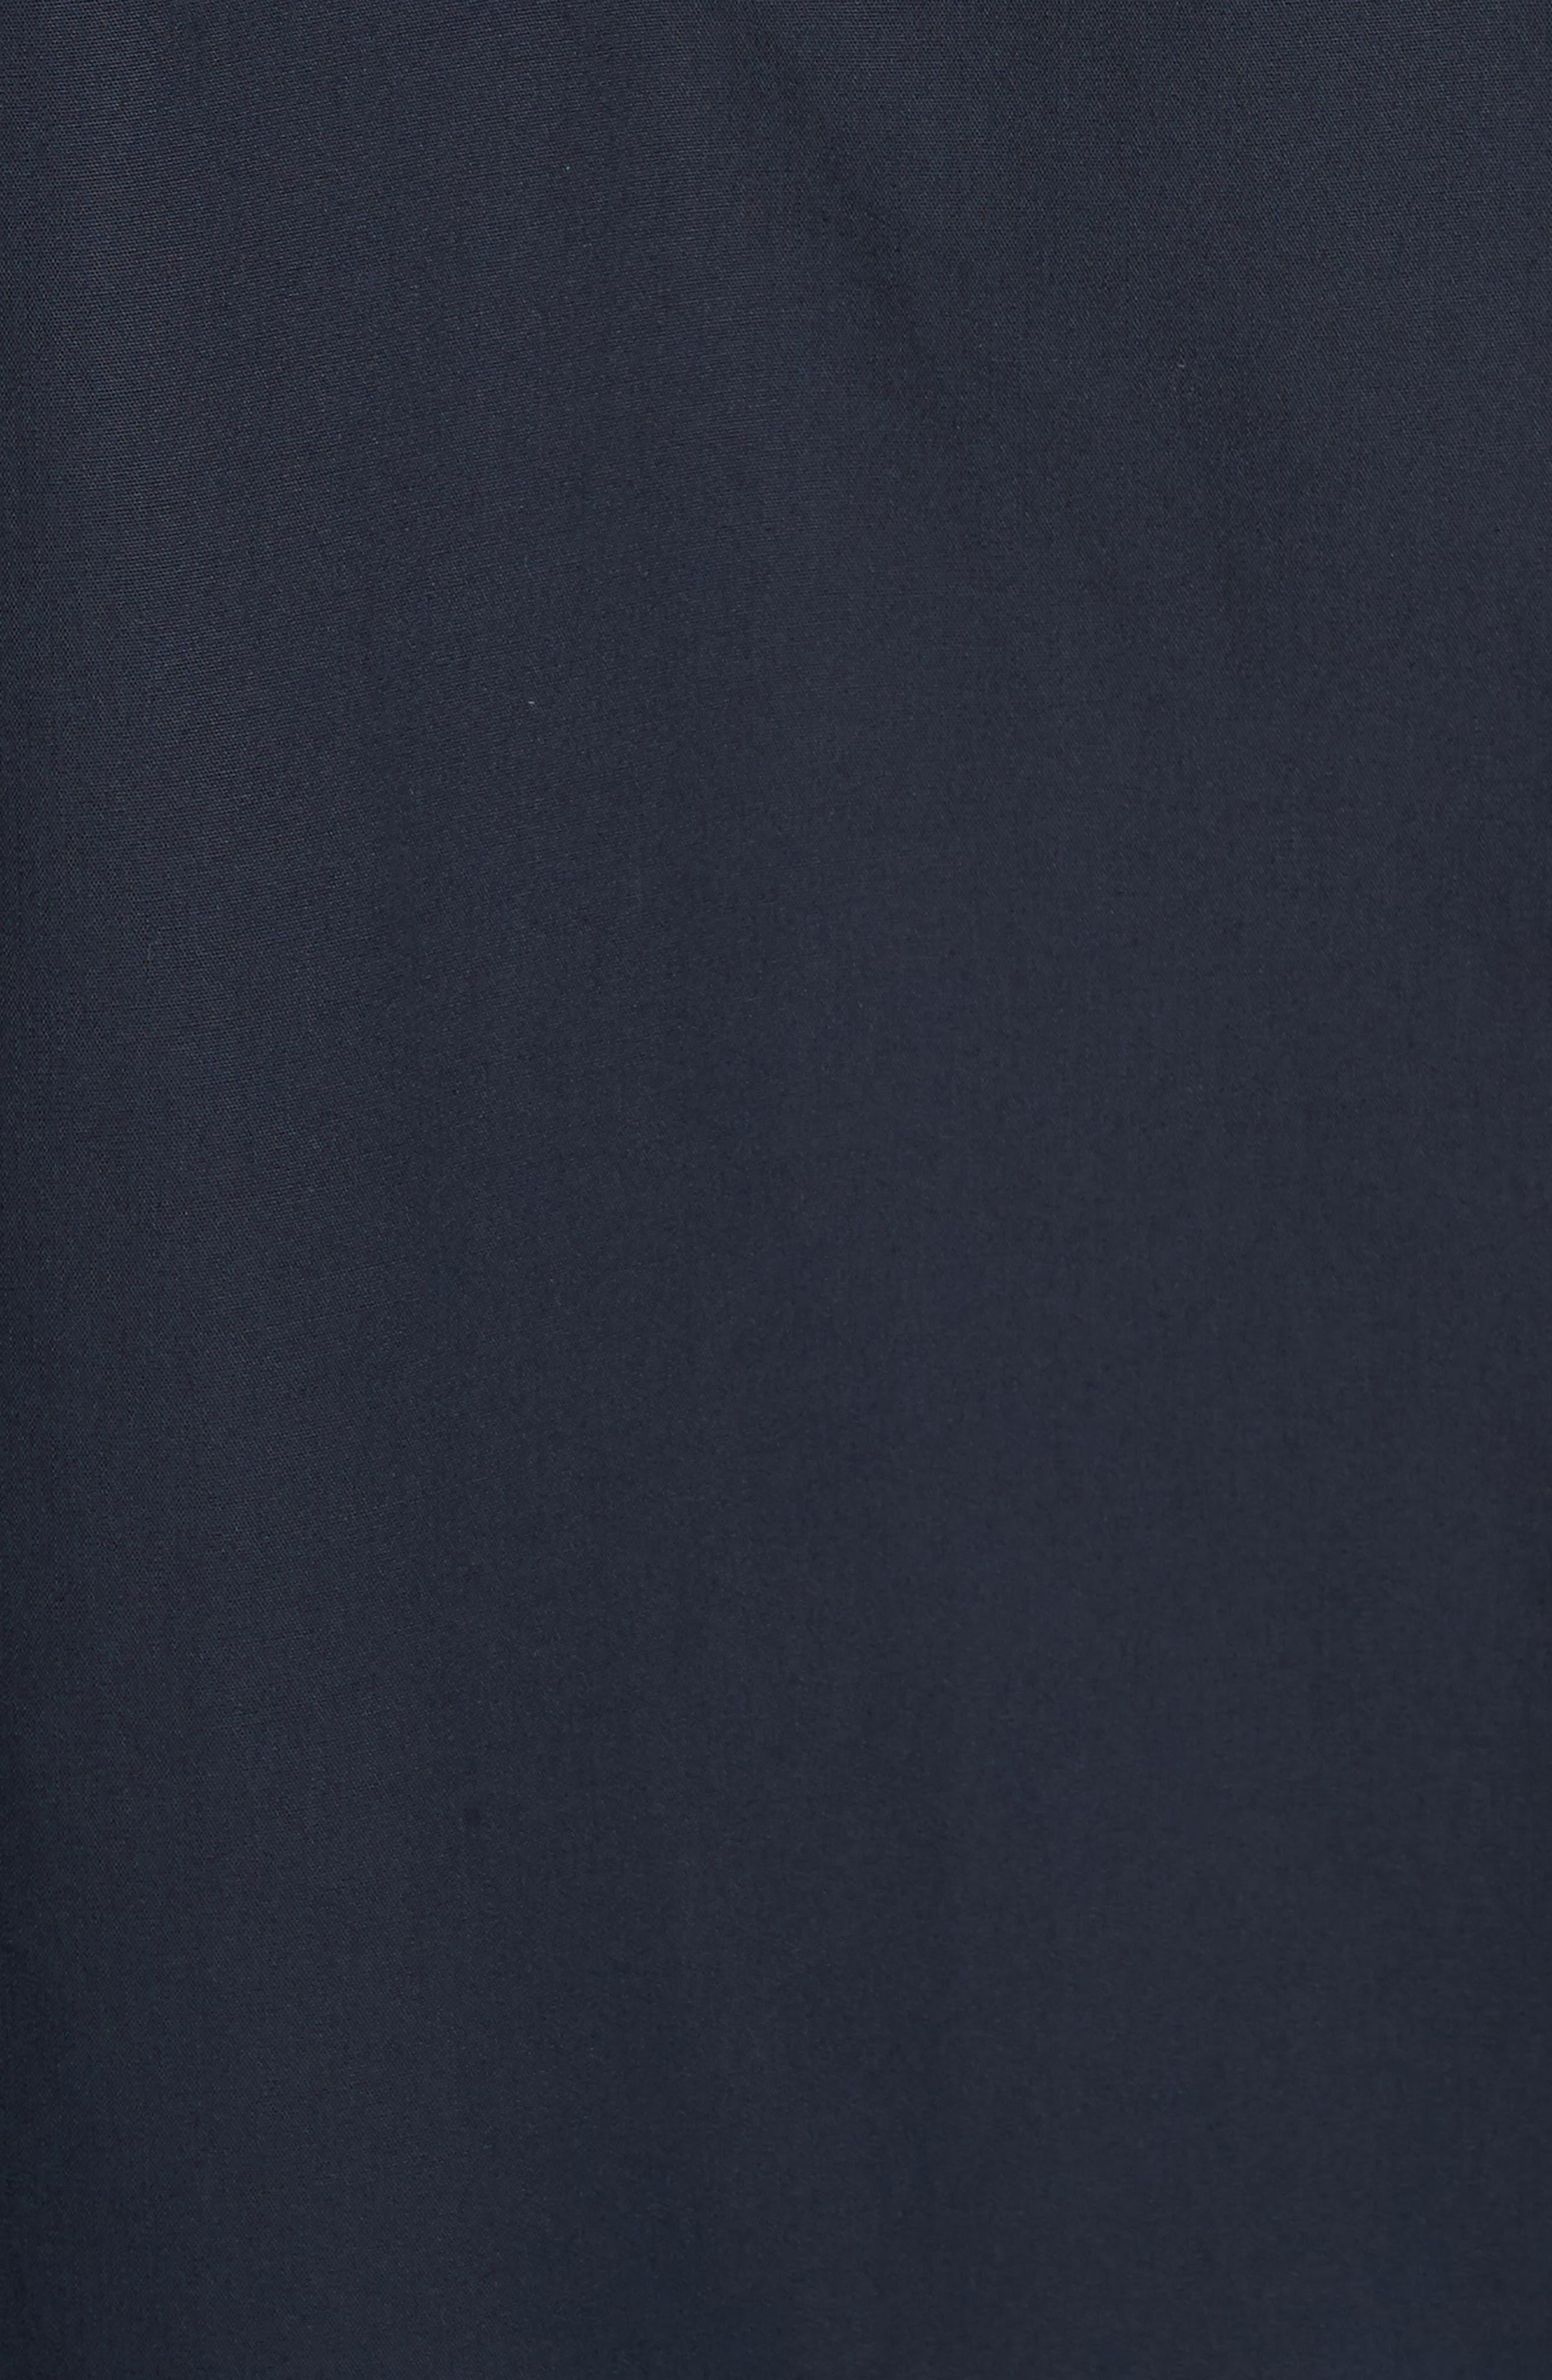 Cotton Poplin Mock Neck Shirt,                             Alternate thumbnail 5, color,                             400